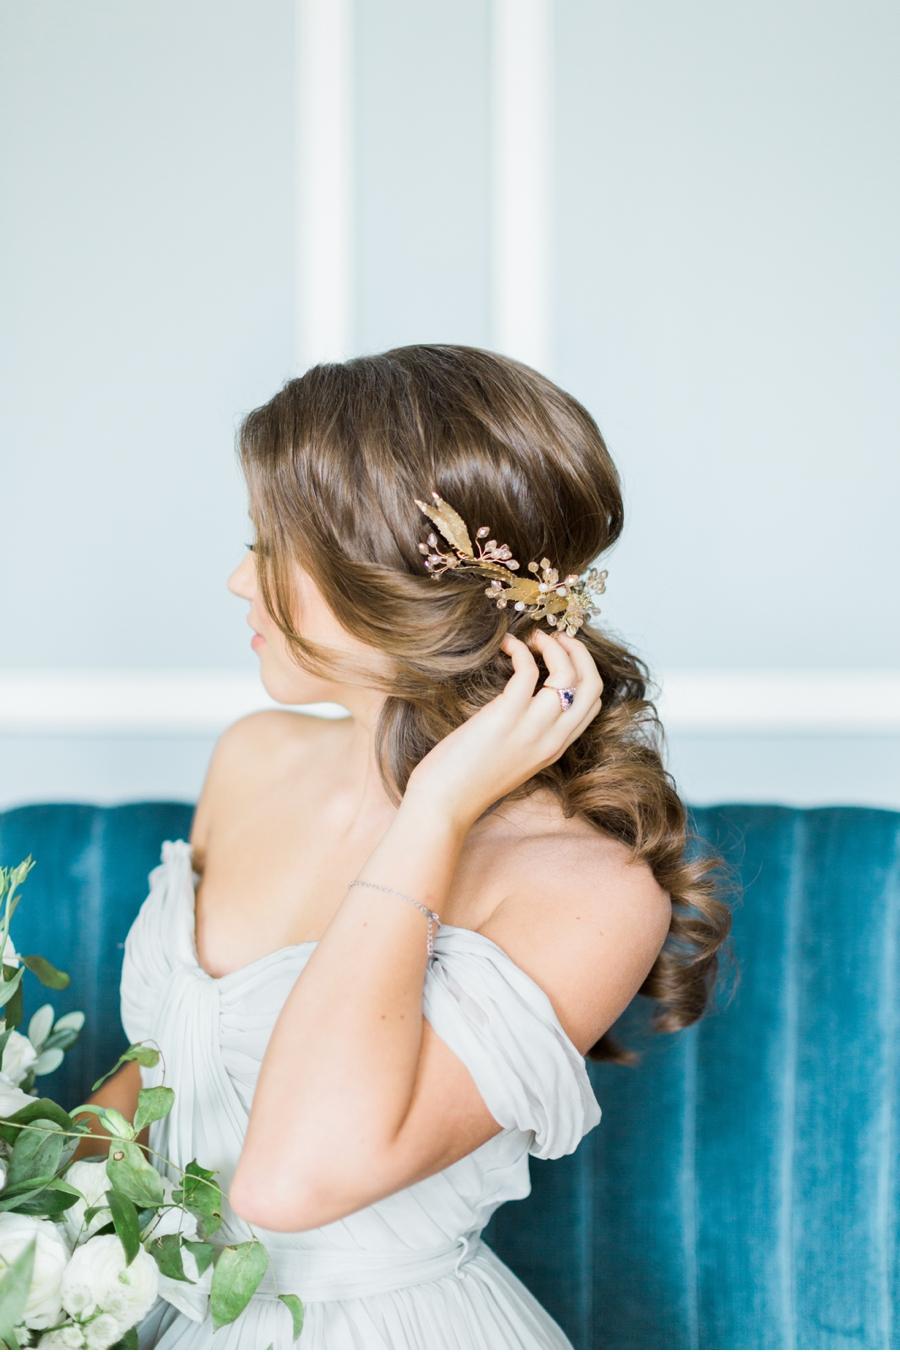 Romantic-Wedding-Hairstyle